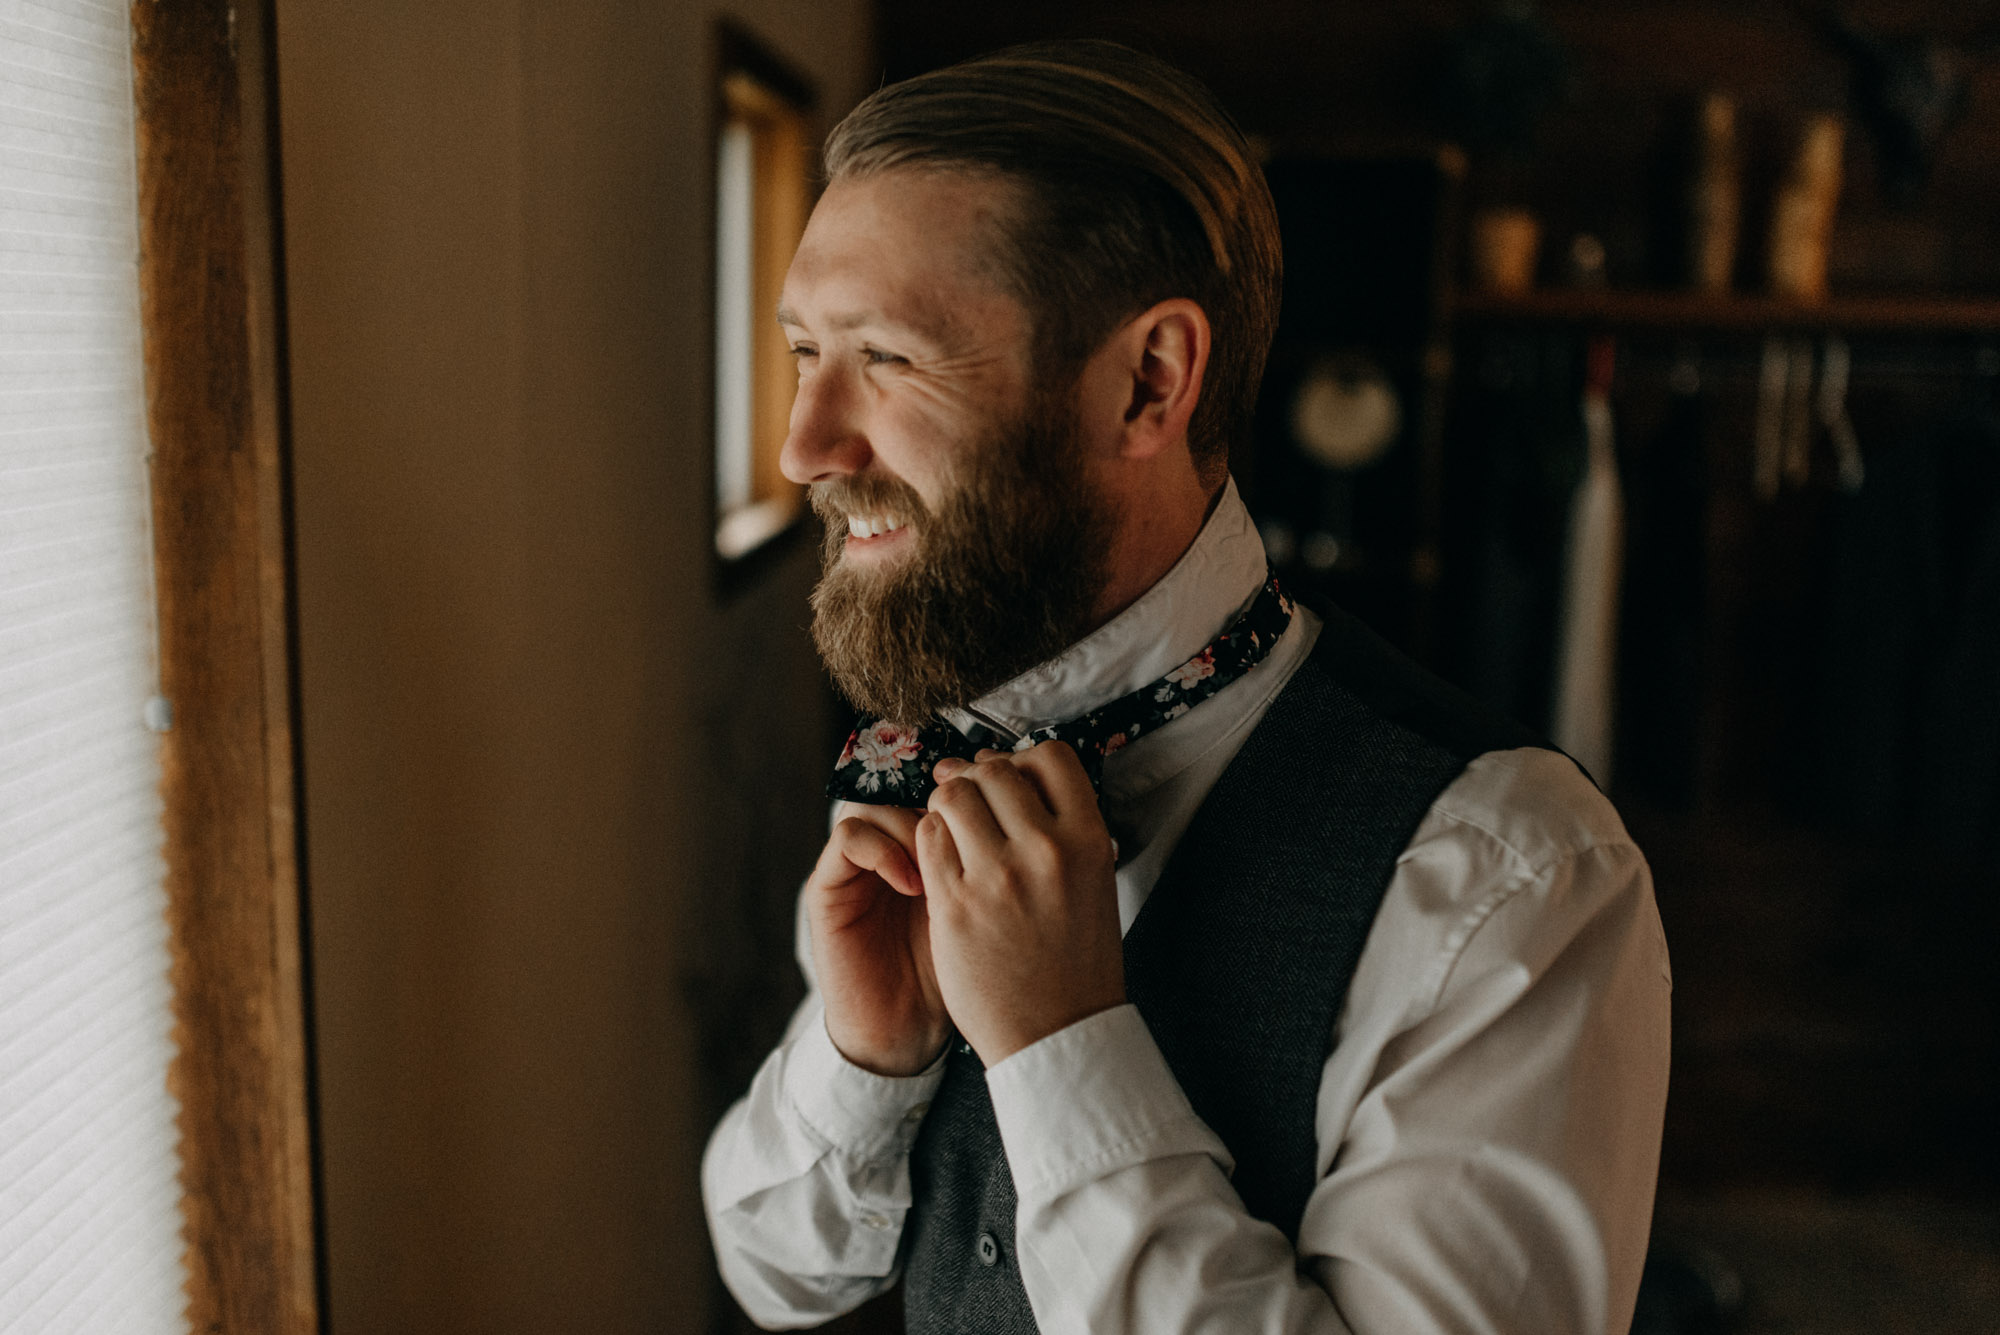 Getting-Ready-Swingset-Washington-Wedding-ringshot-7791.jpg